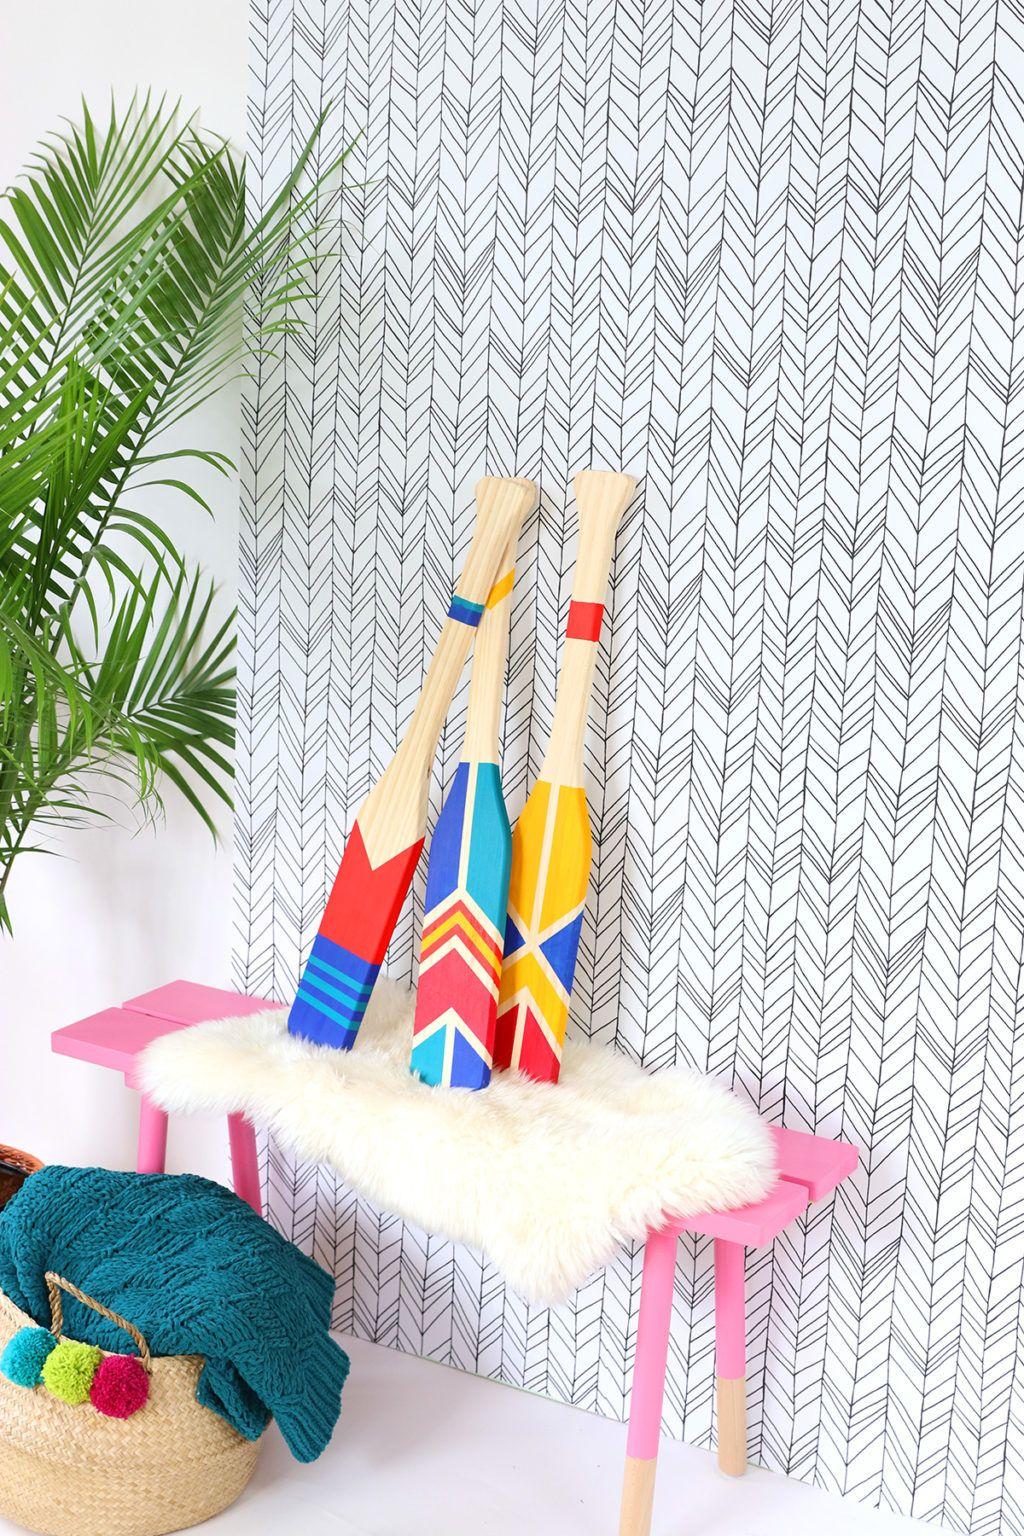 DIY Painted Oars Home Decor   Crafts & DIY Ideas   Pinterest ...